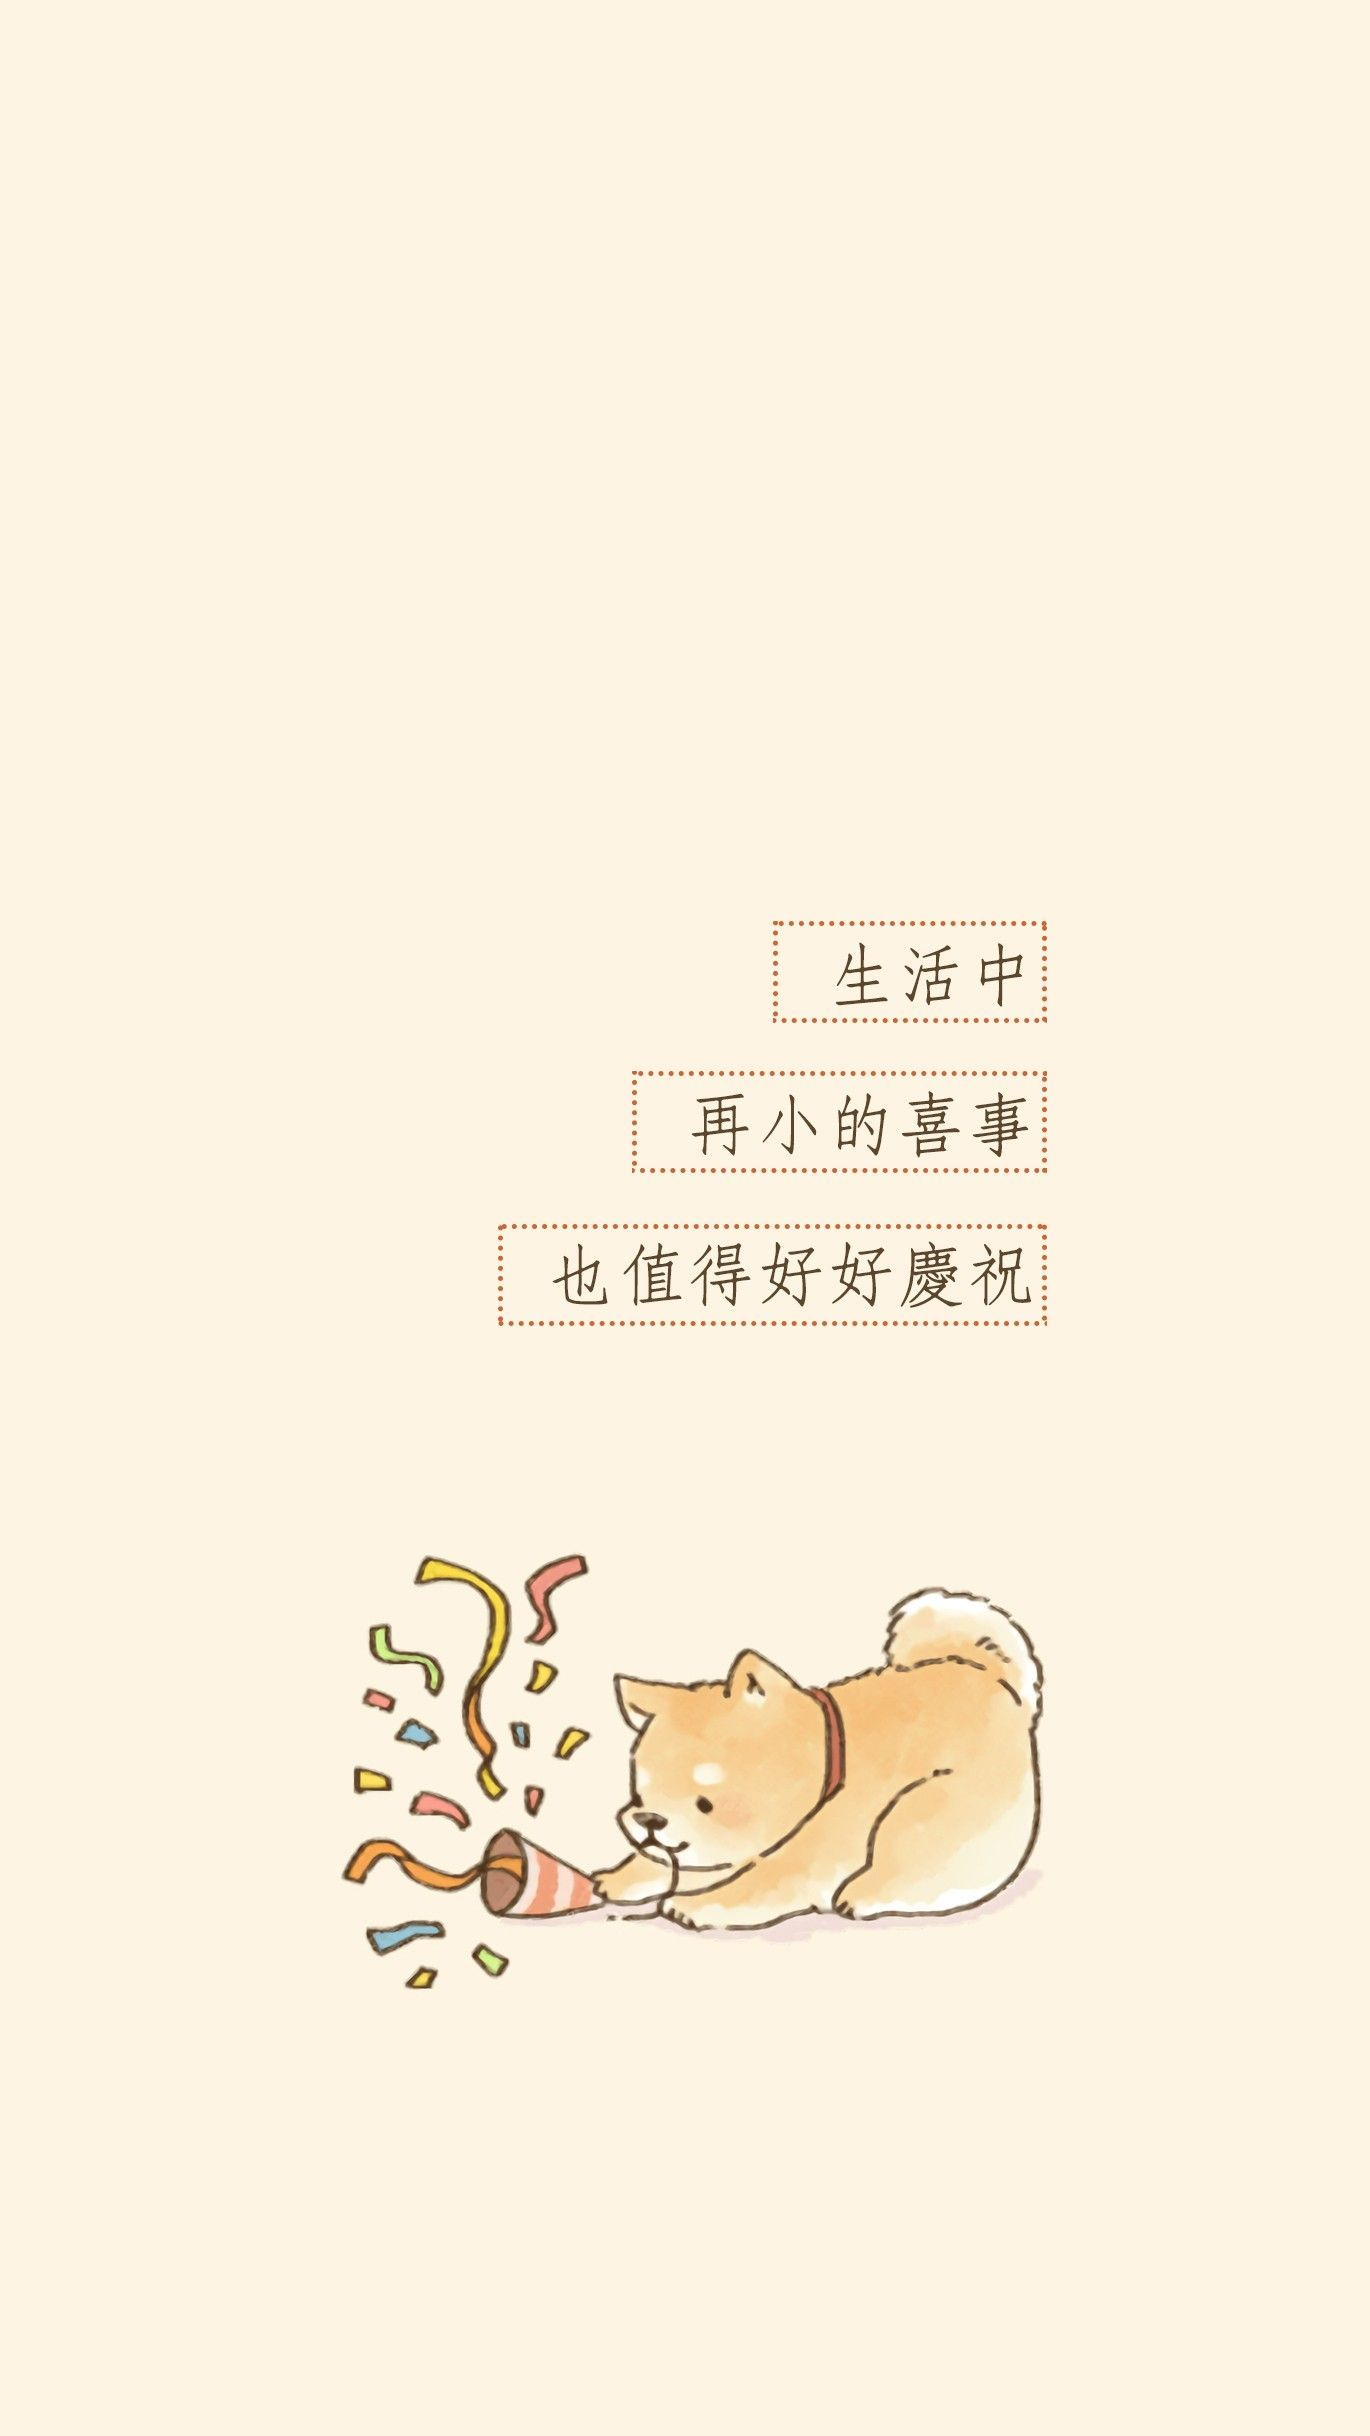 Iphone Animal Drawing Wallpaper Http Wallpapersalbum Com Iphone Animal Drawing Wallpaper Html Cute Dog Drawing Cute Wallpapers Cute Animal Drawings